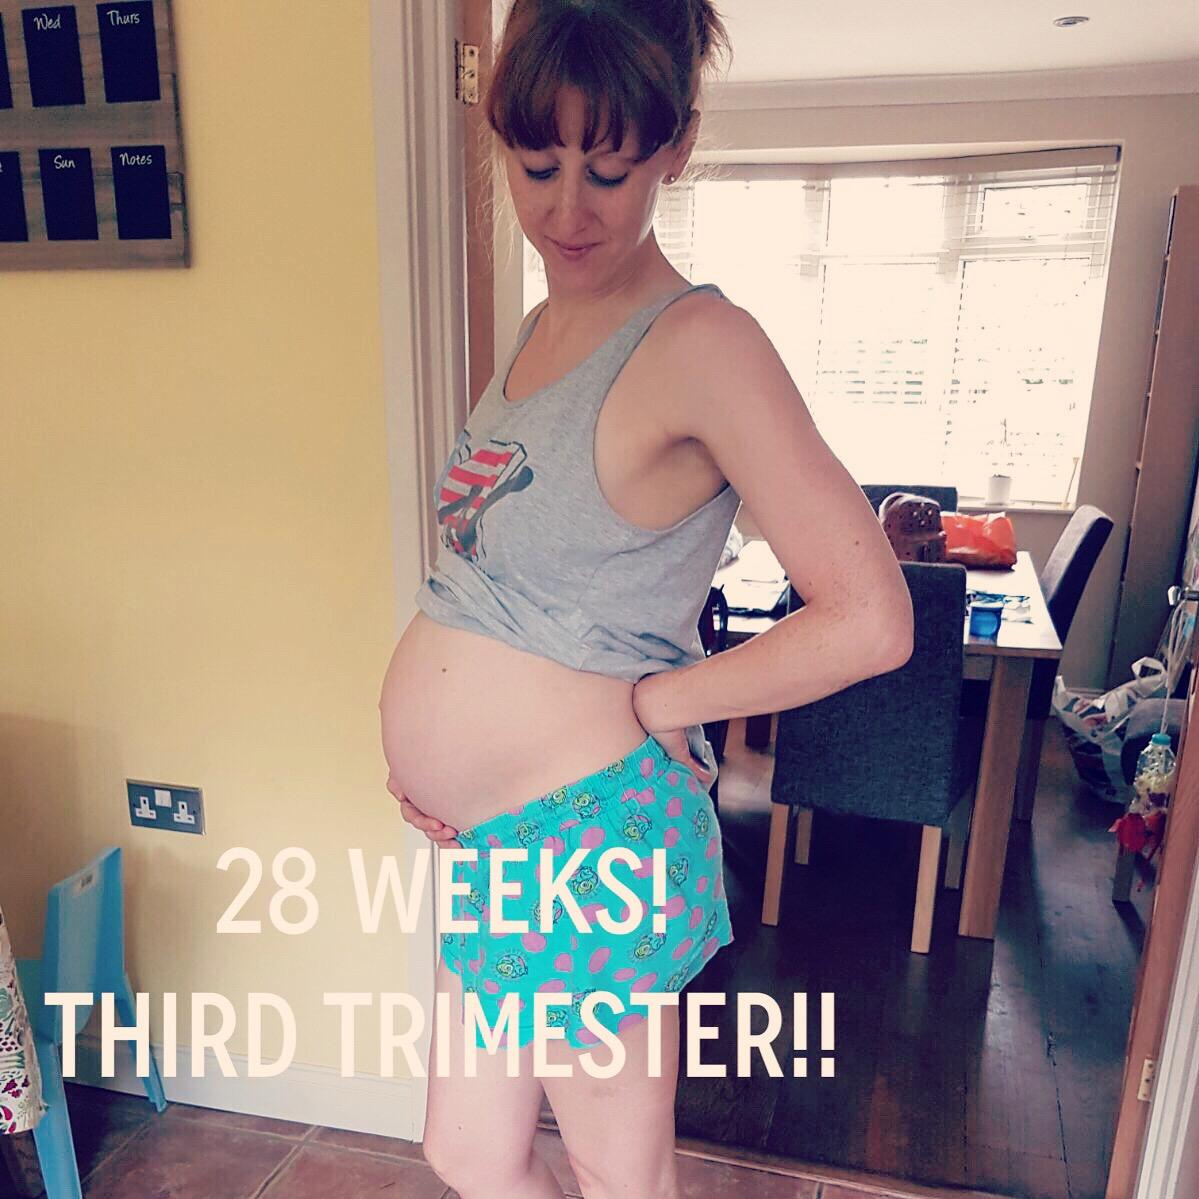 28 Weeks Pregnant – Bump Update!